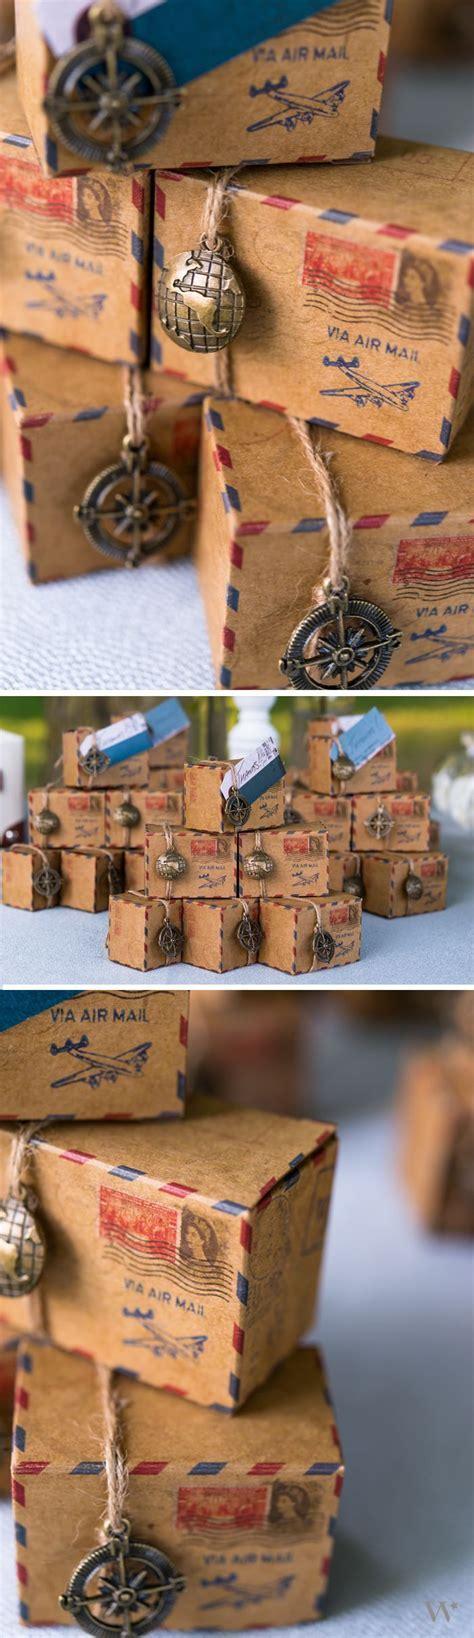 17 Best ideas about Wedding Favor Boxes on Pinterest